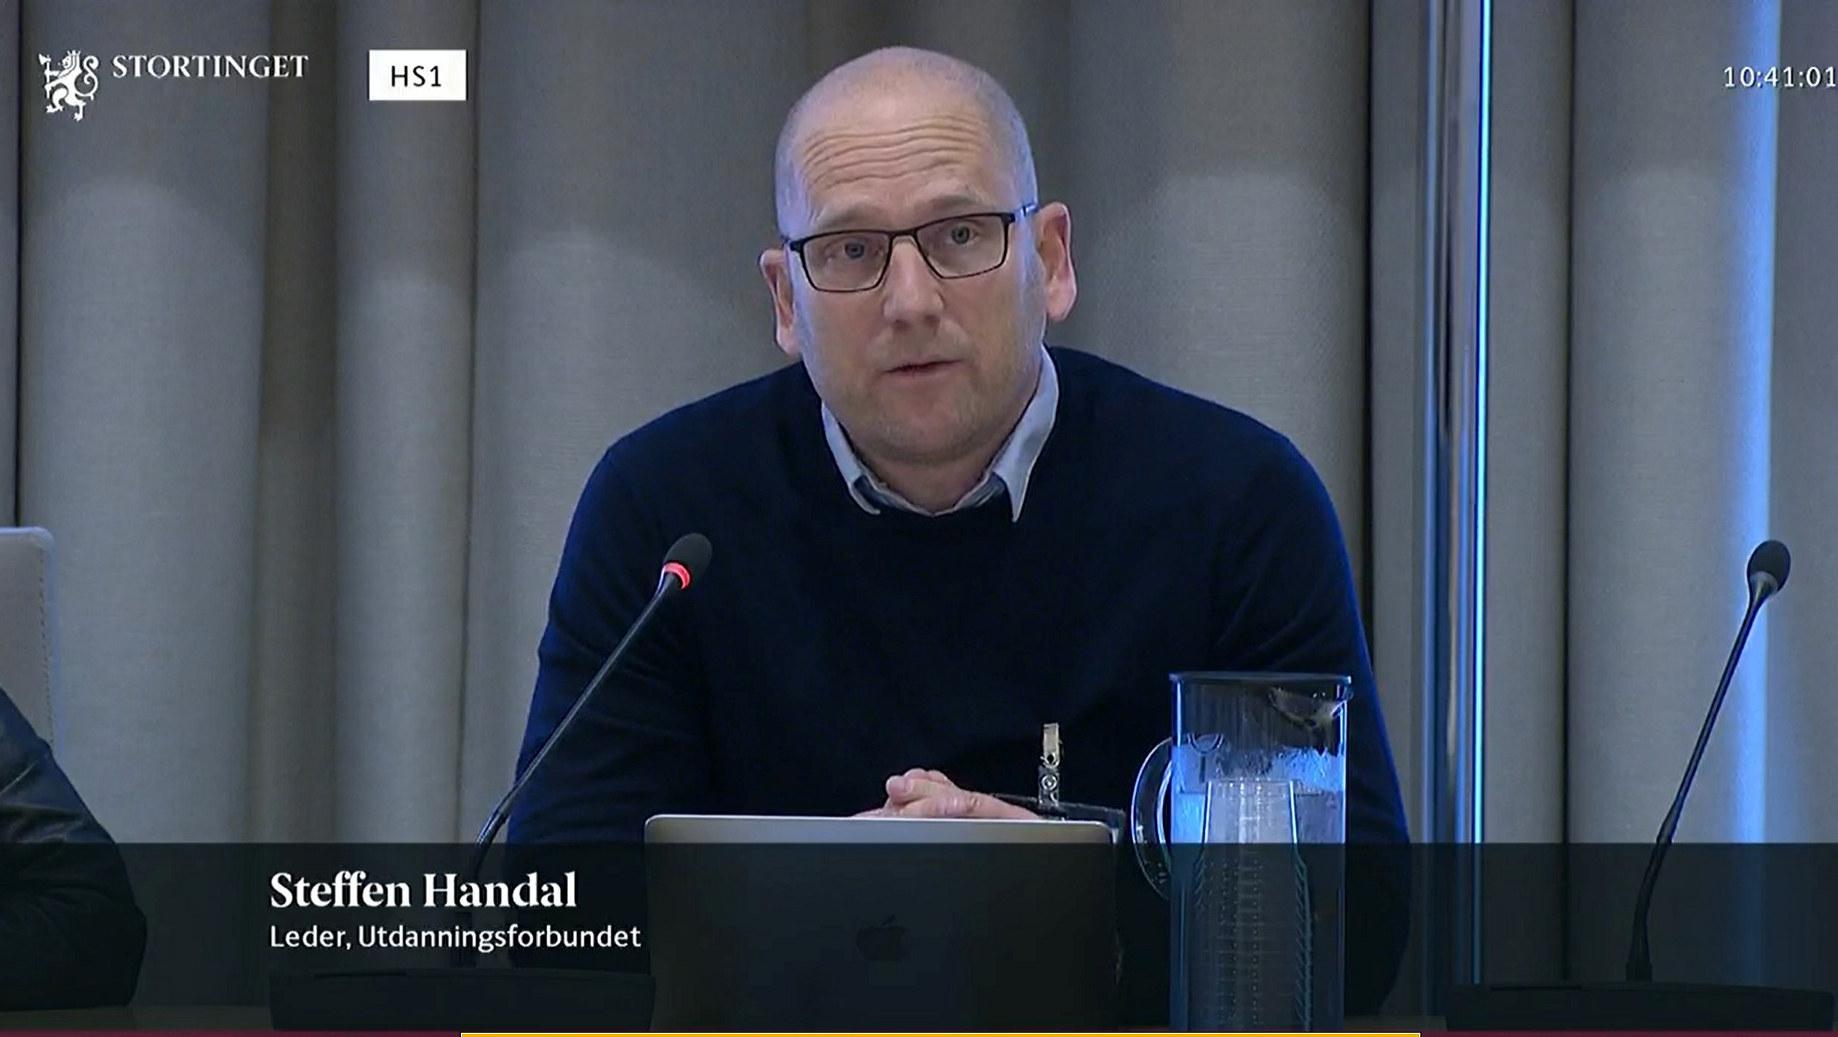 Utdanningsforbundet ga sin fulle støtte til forslaget om tillitsreform i skolen i høringen i utdannings- og forskningskomiteen, her ved leder Steffen Handal. Foto: Stortinget